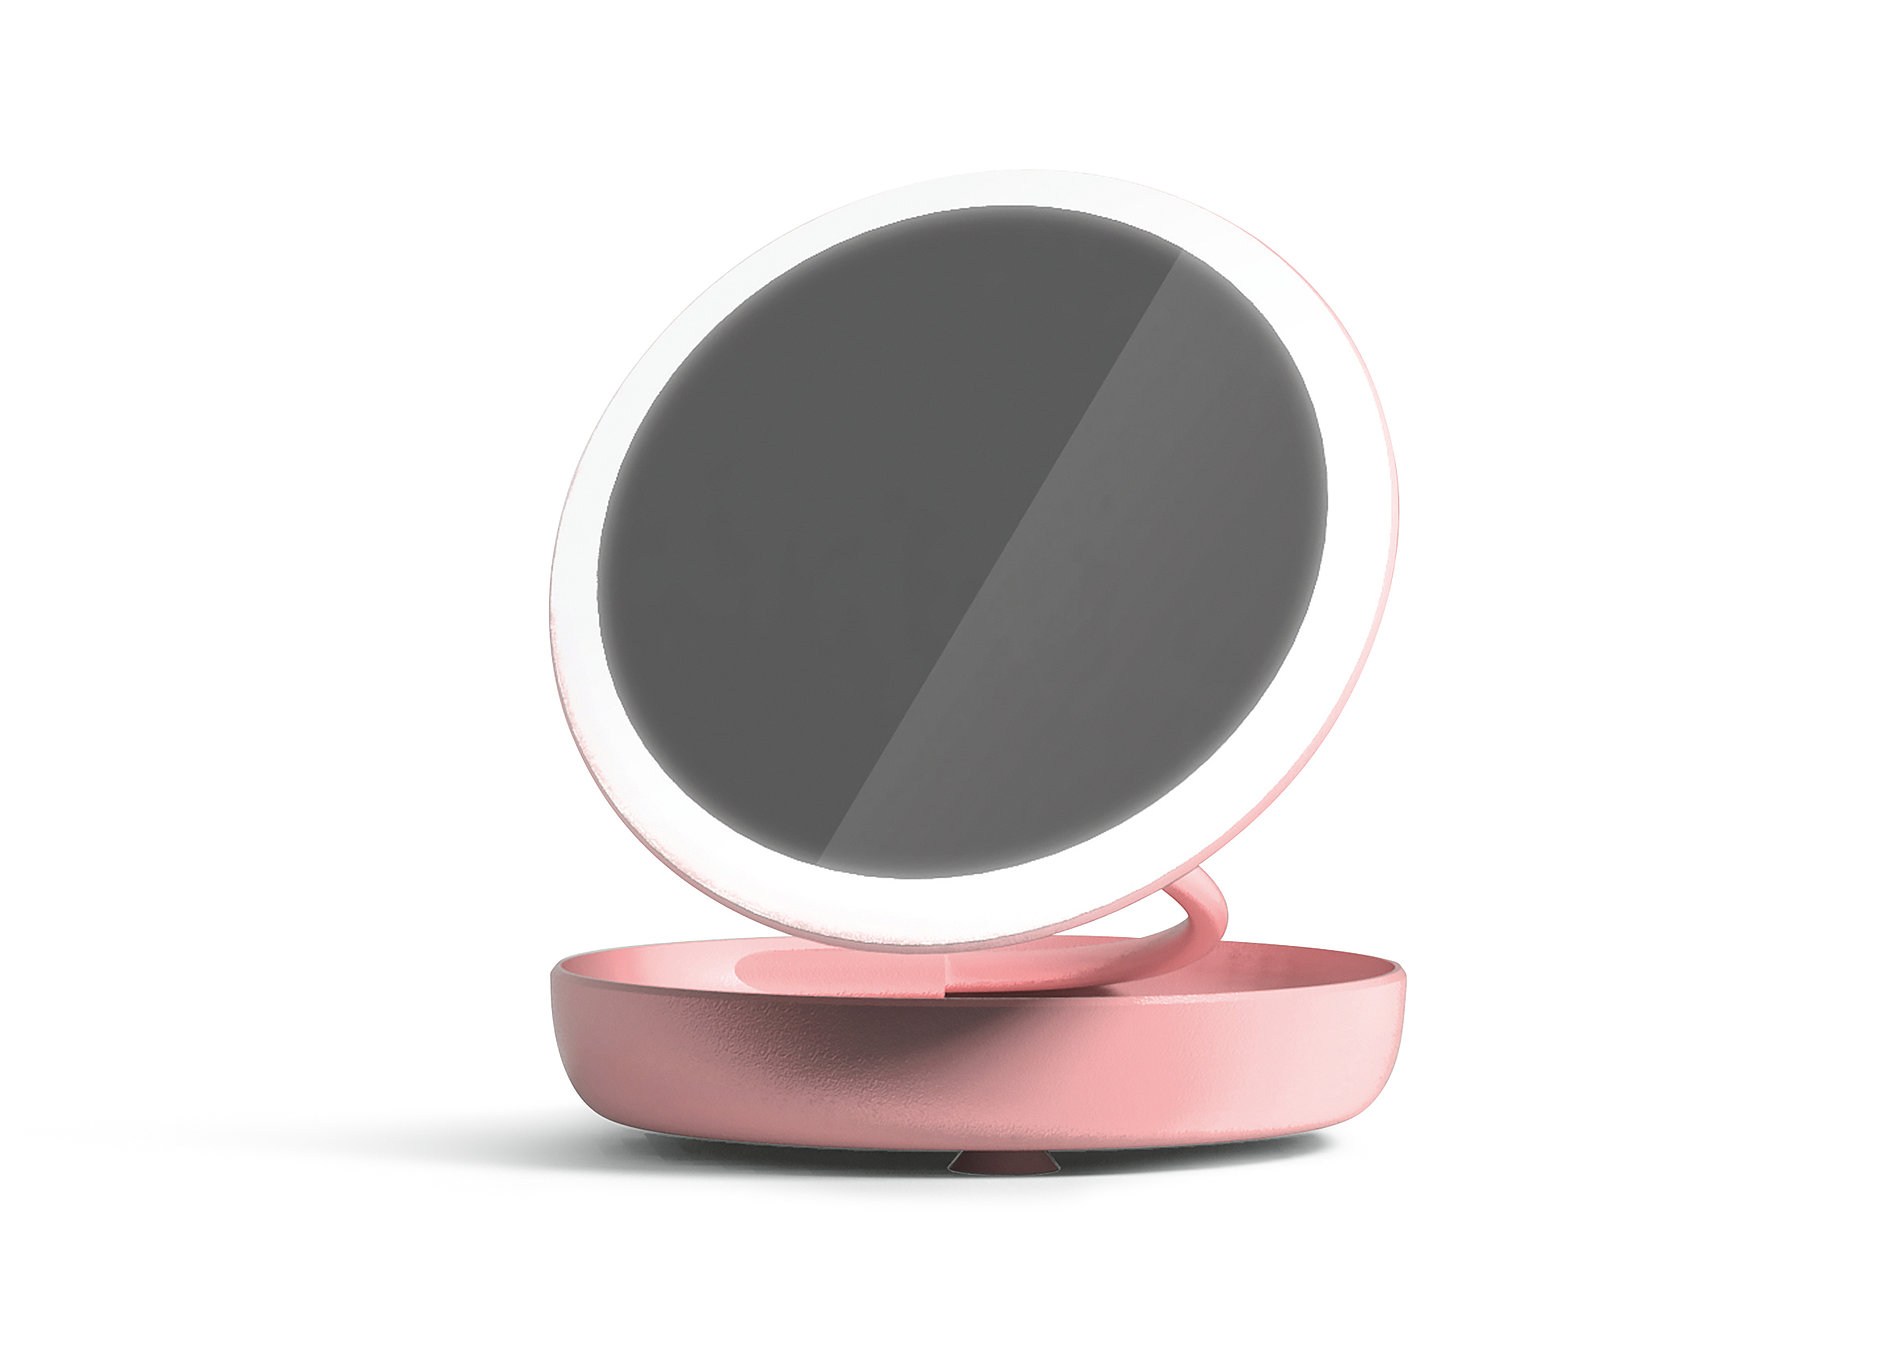 The Magic Mirror | Red Dot Design Award